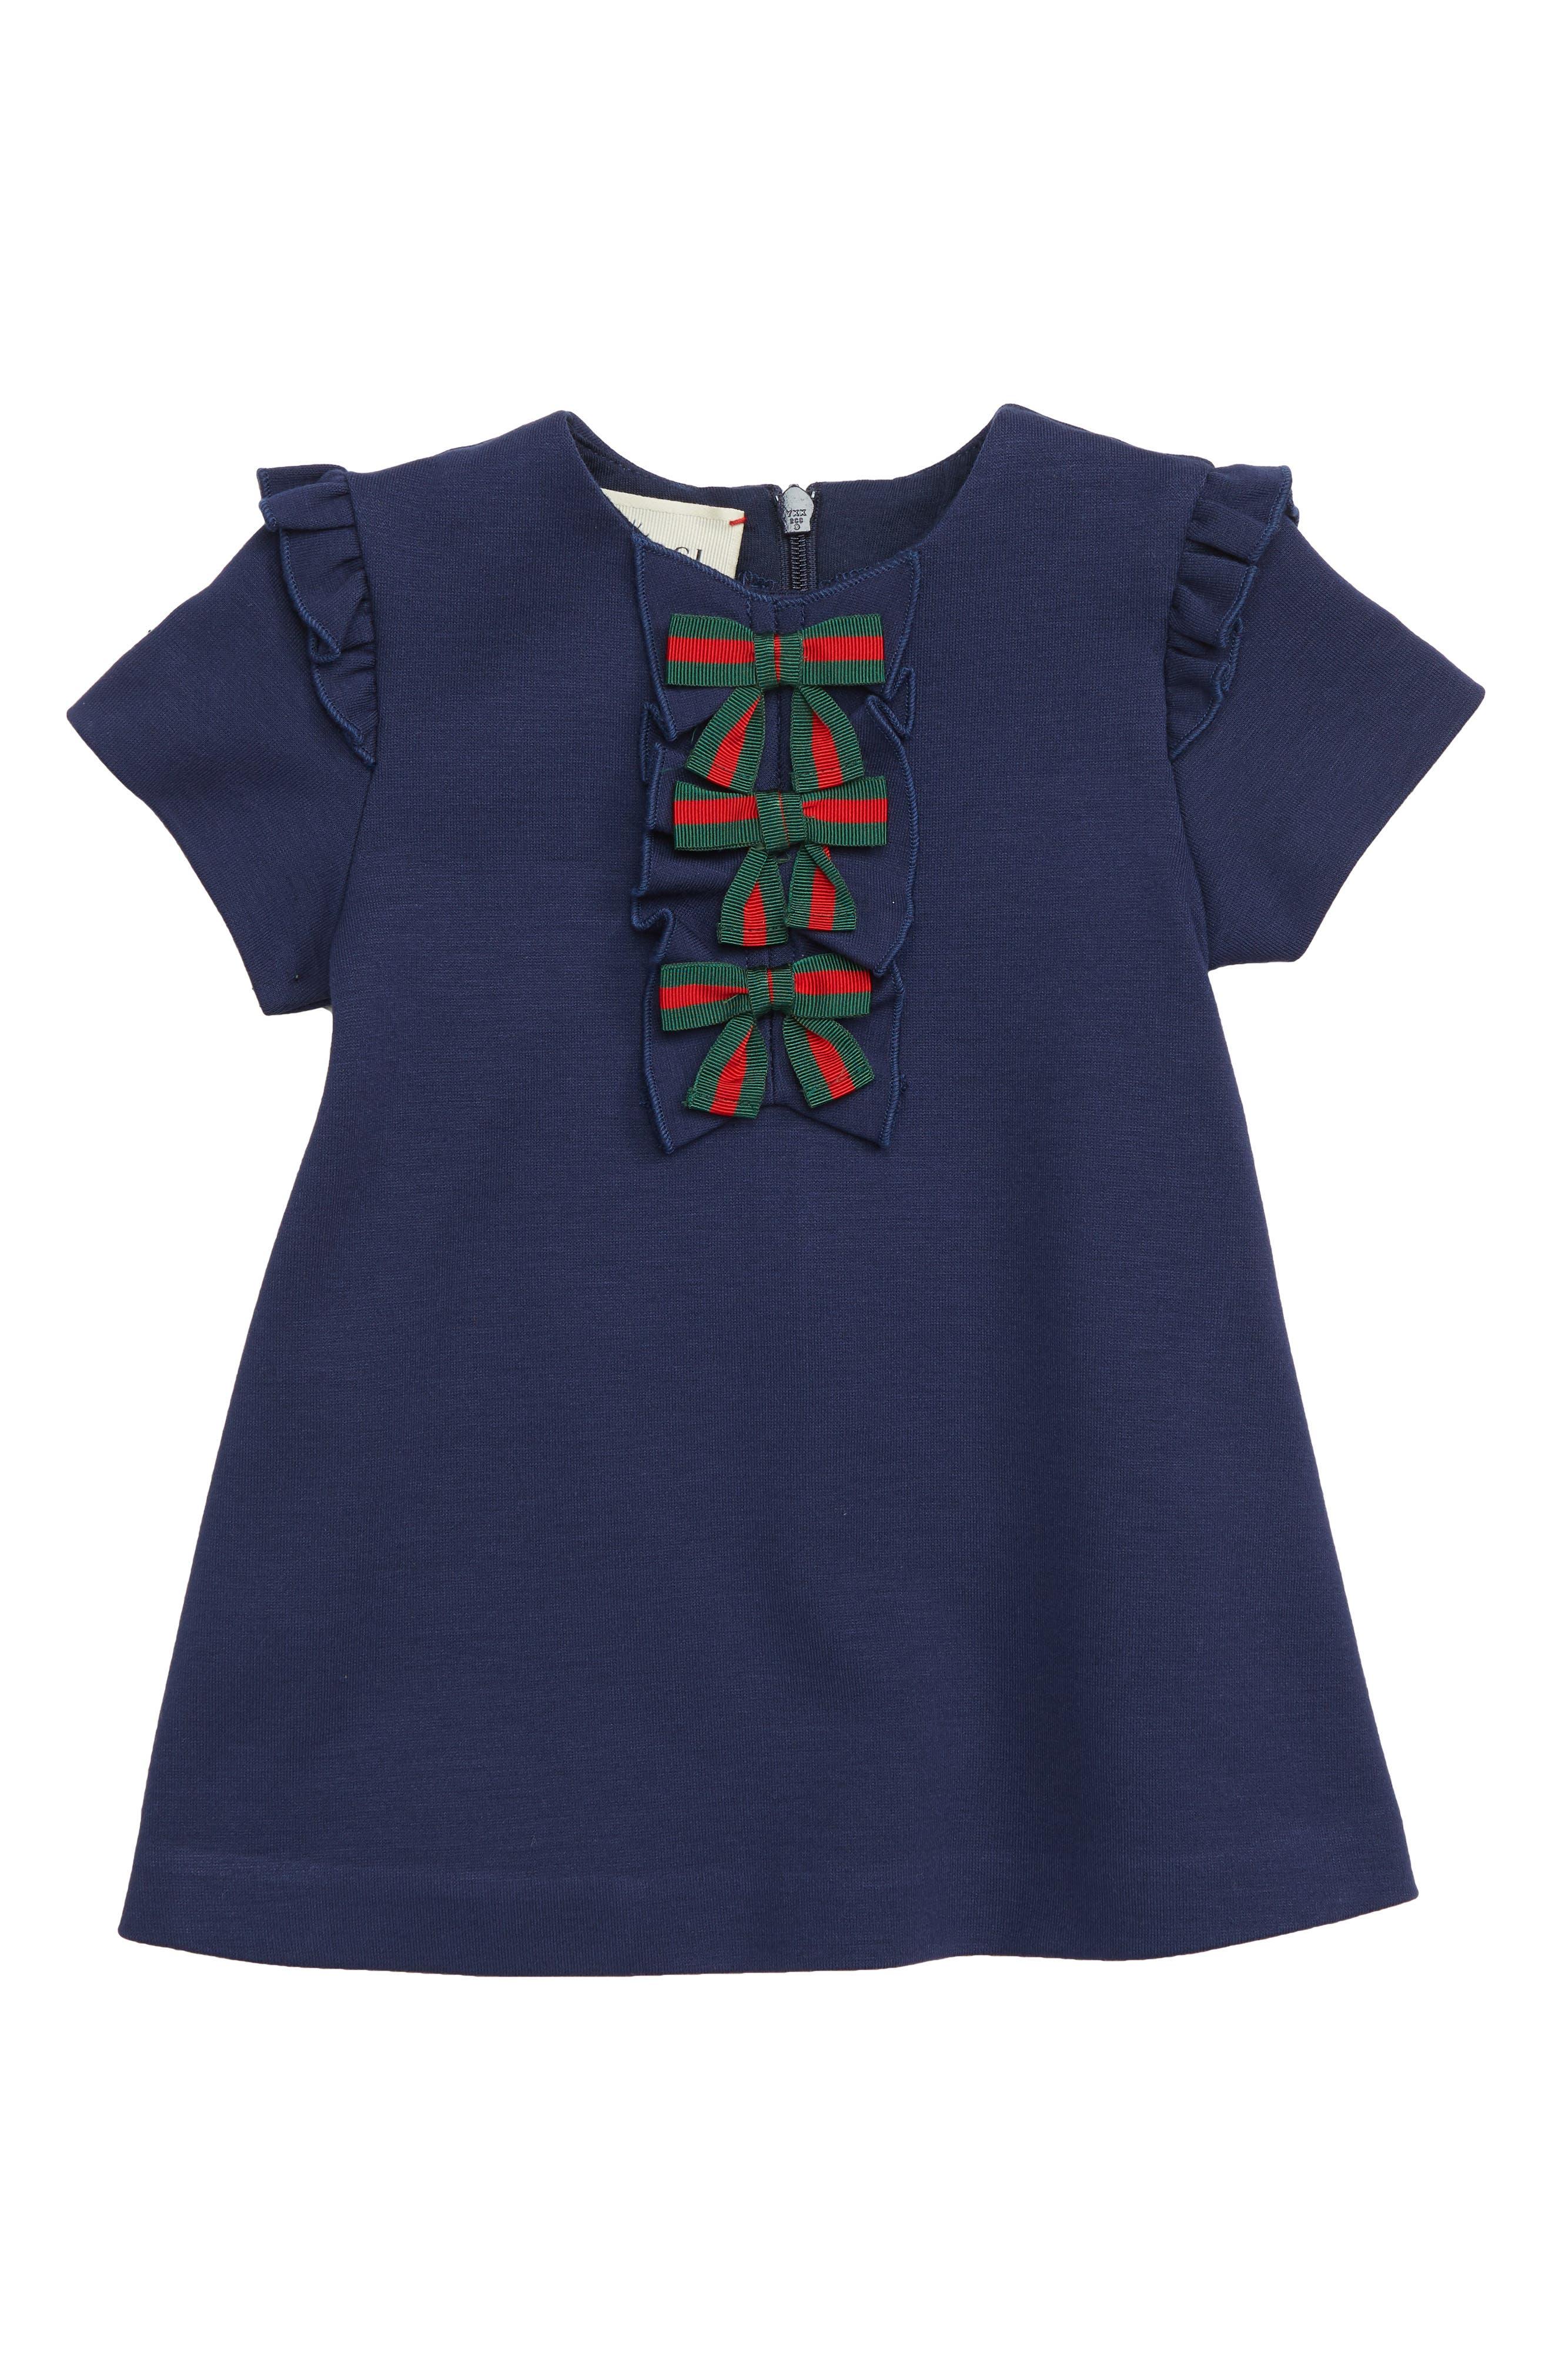 Ruffle & Bow Dress,                         Main,                         color, COBALTO/ GREEN/ RED